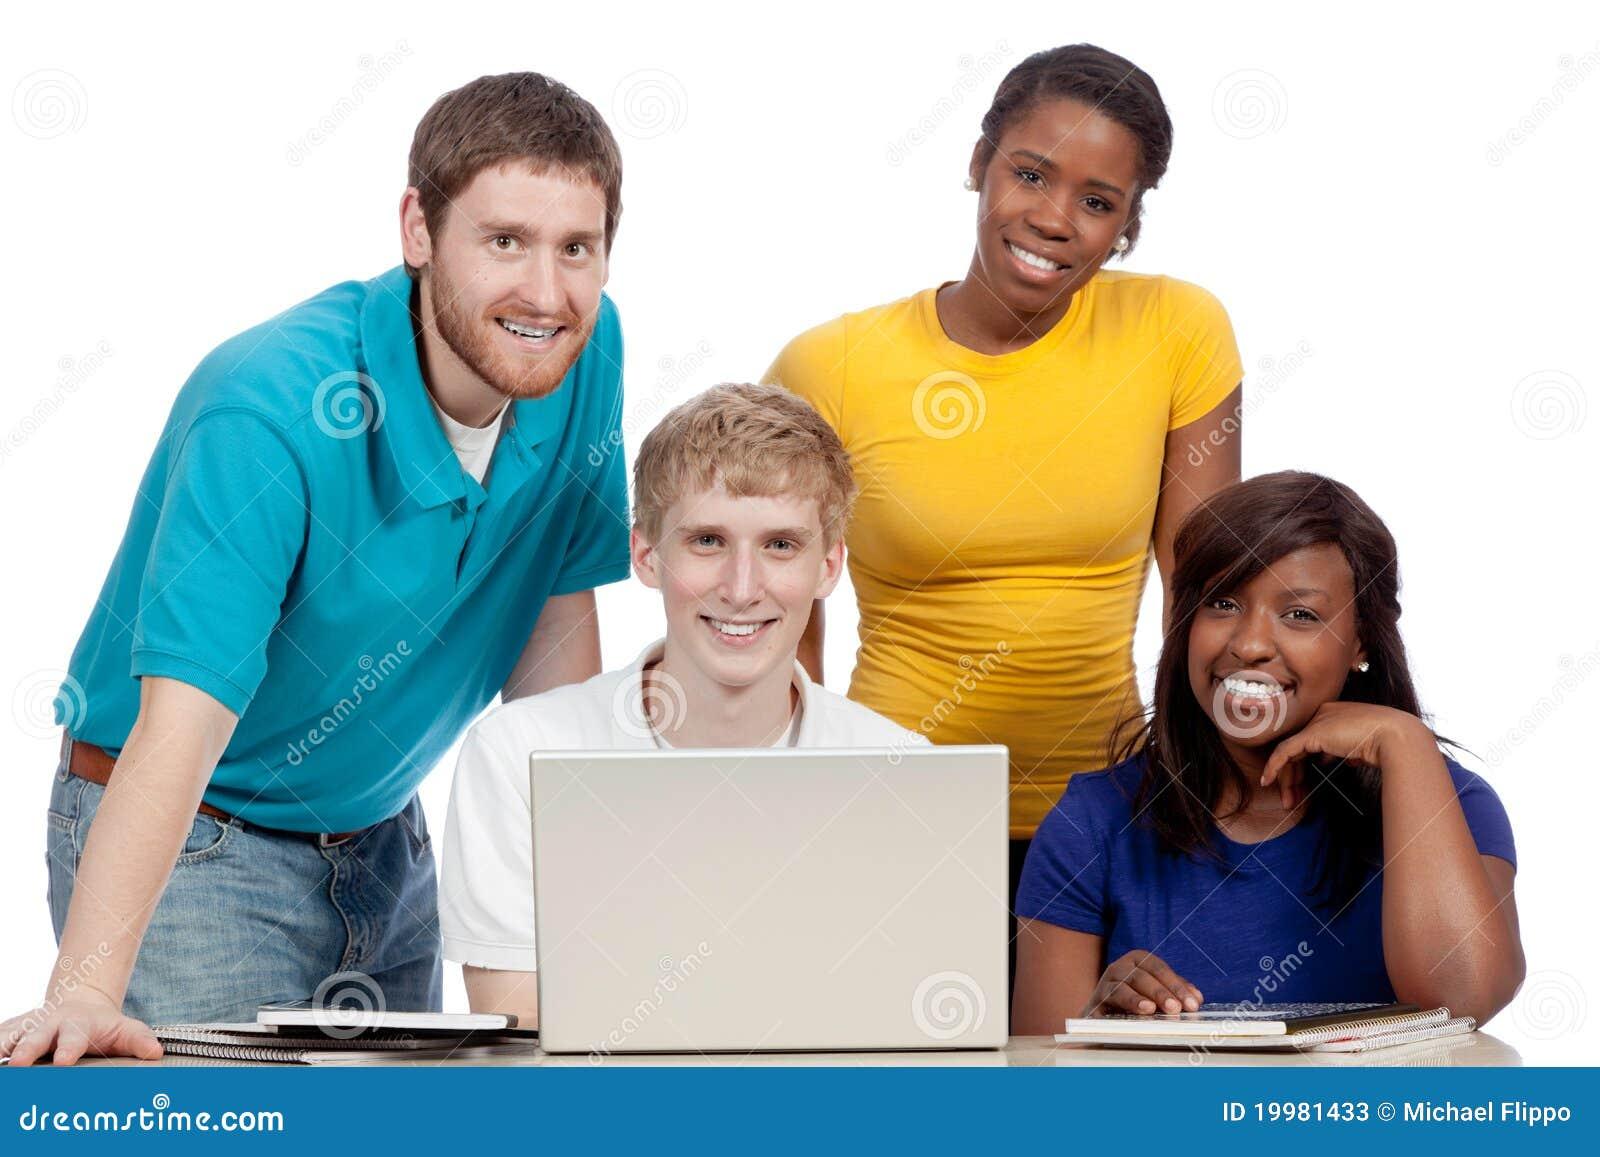 Computer deals for university students